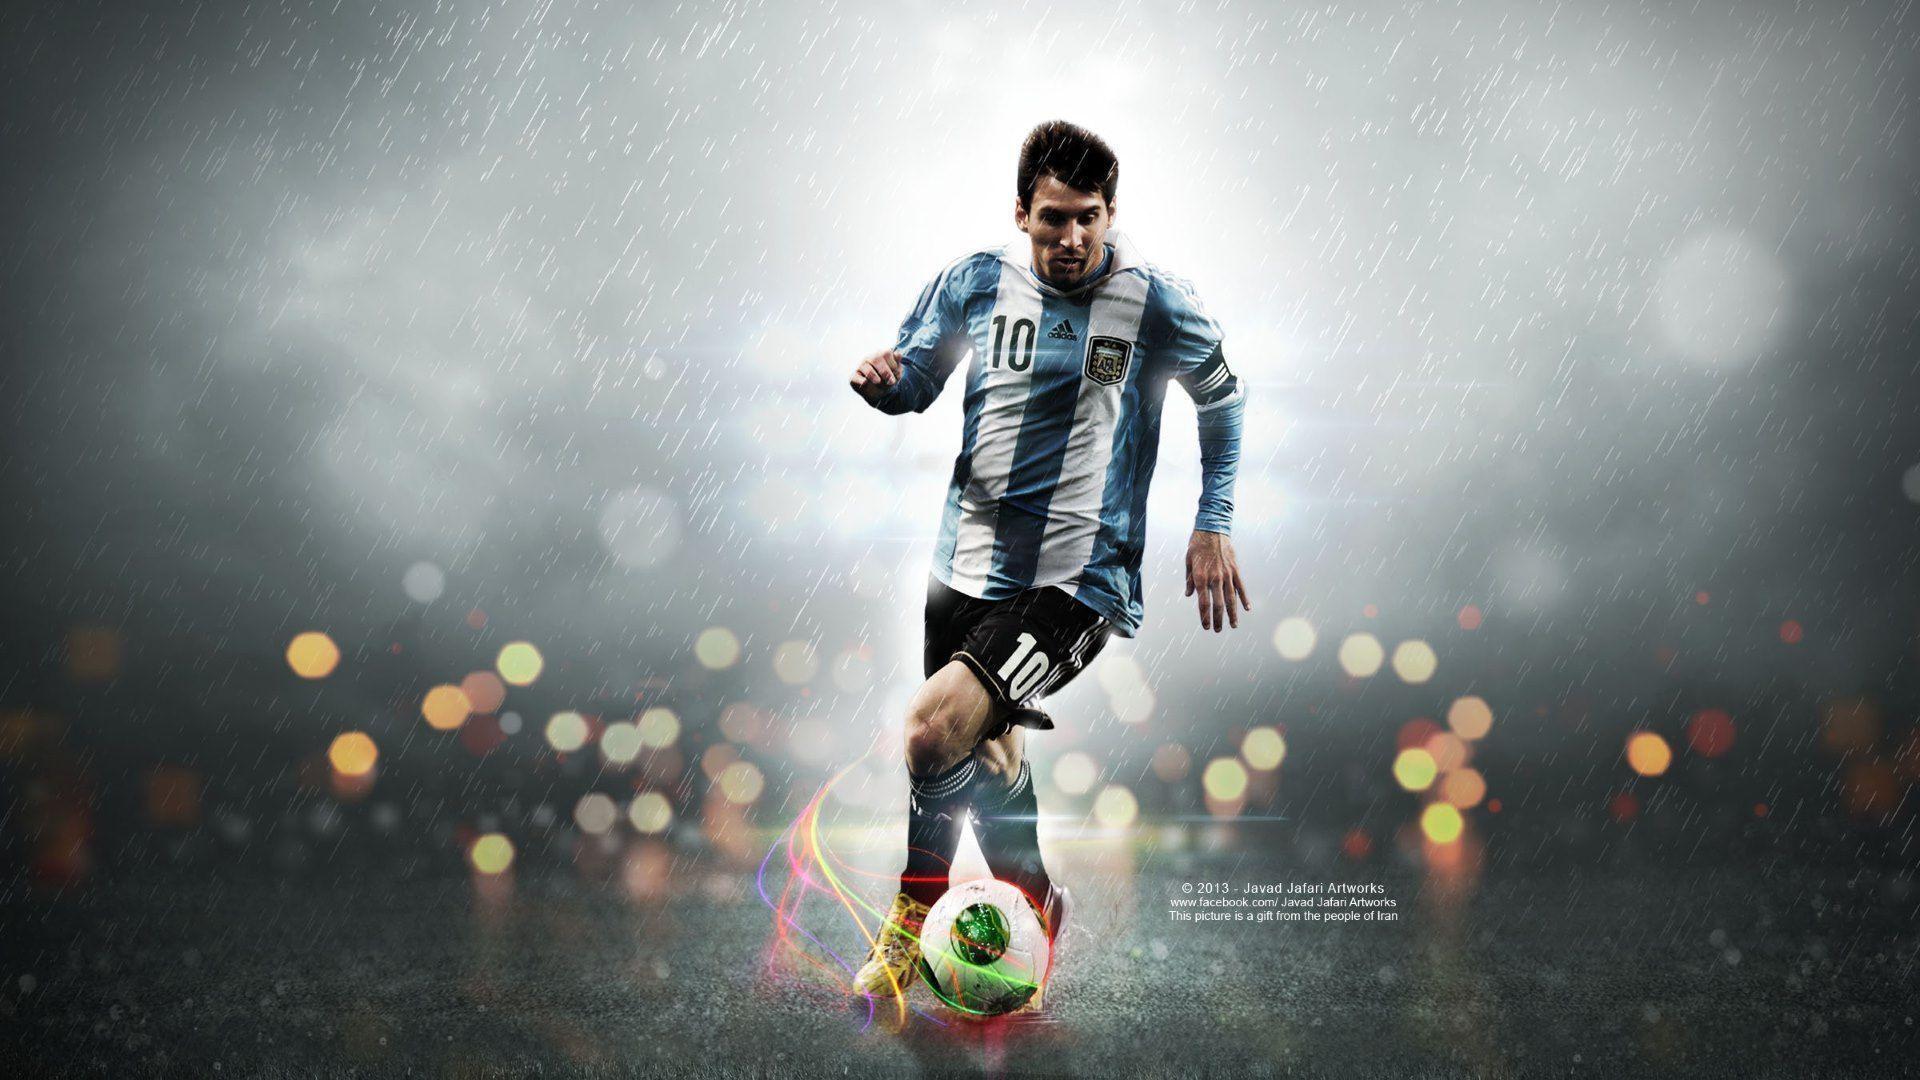 Messi HD Wallpapers 1080p 2017 - Wallpaper Cave